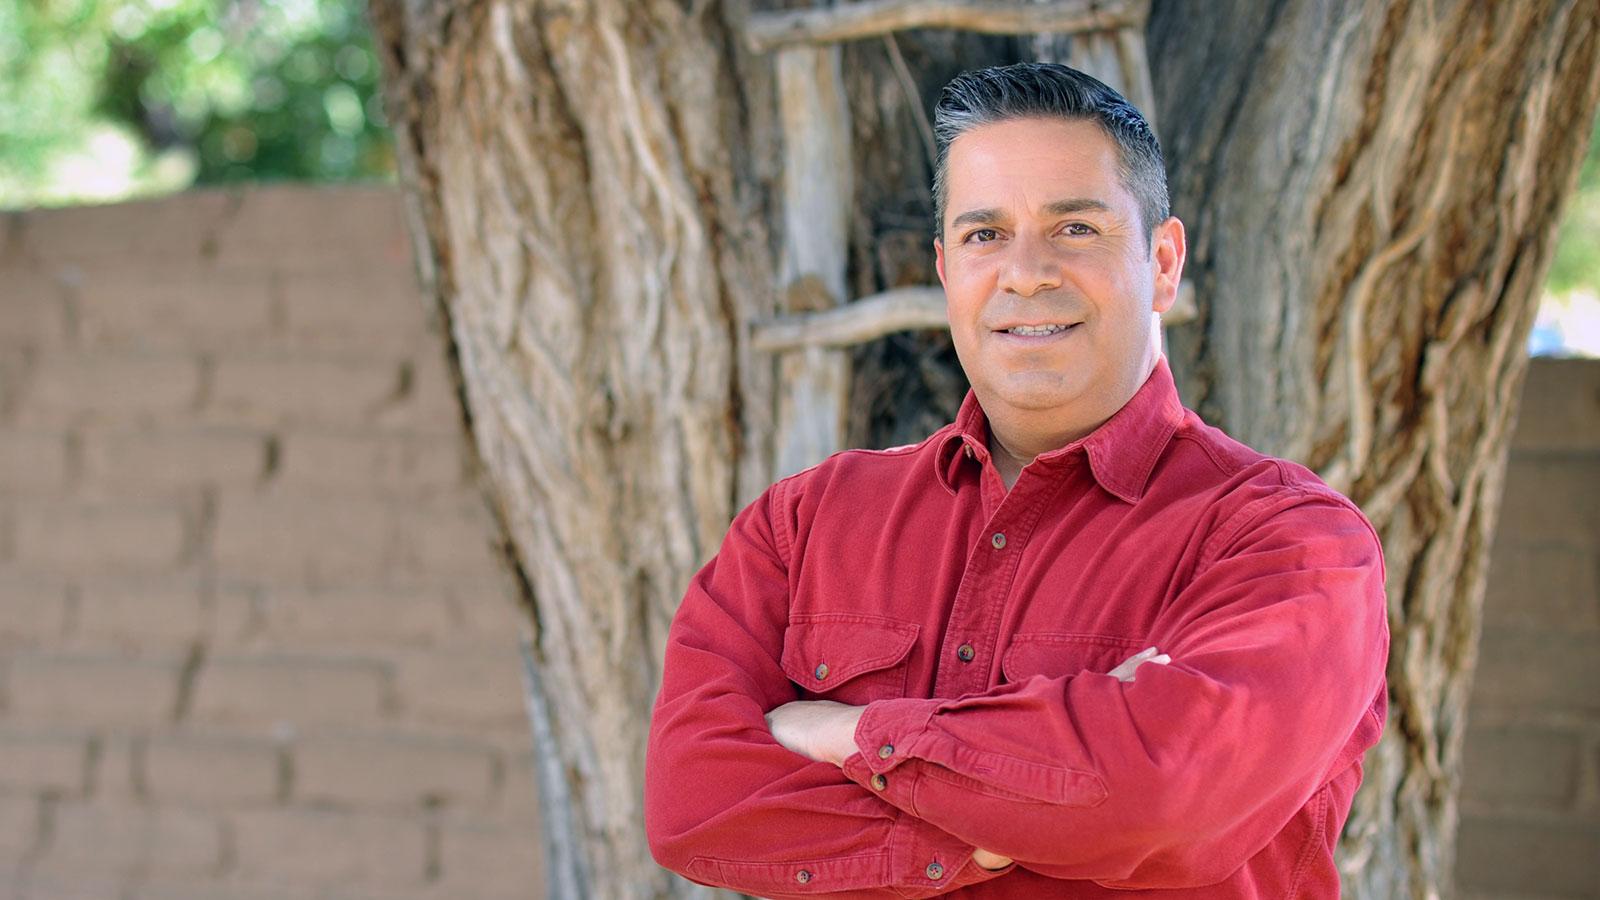 HRC Endorses Rep. Ben Ray Luján for U.S. Senate